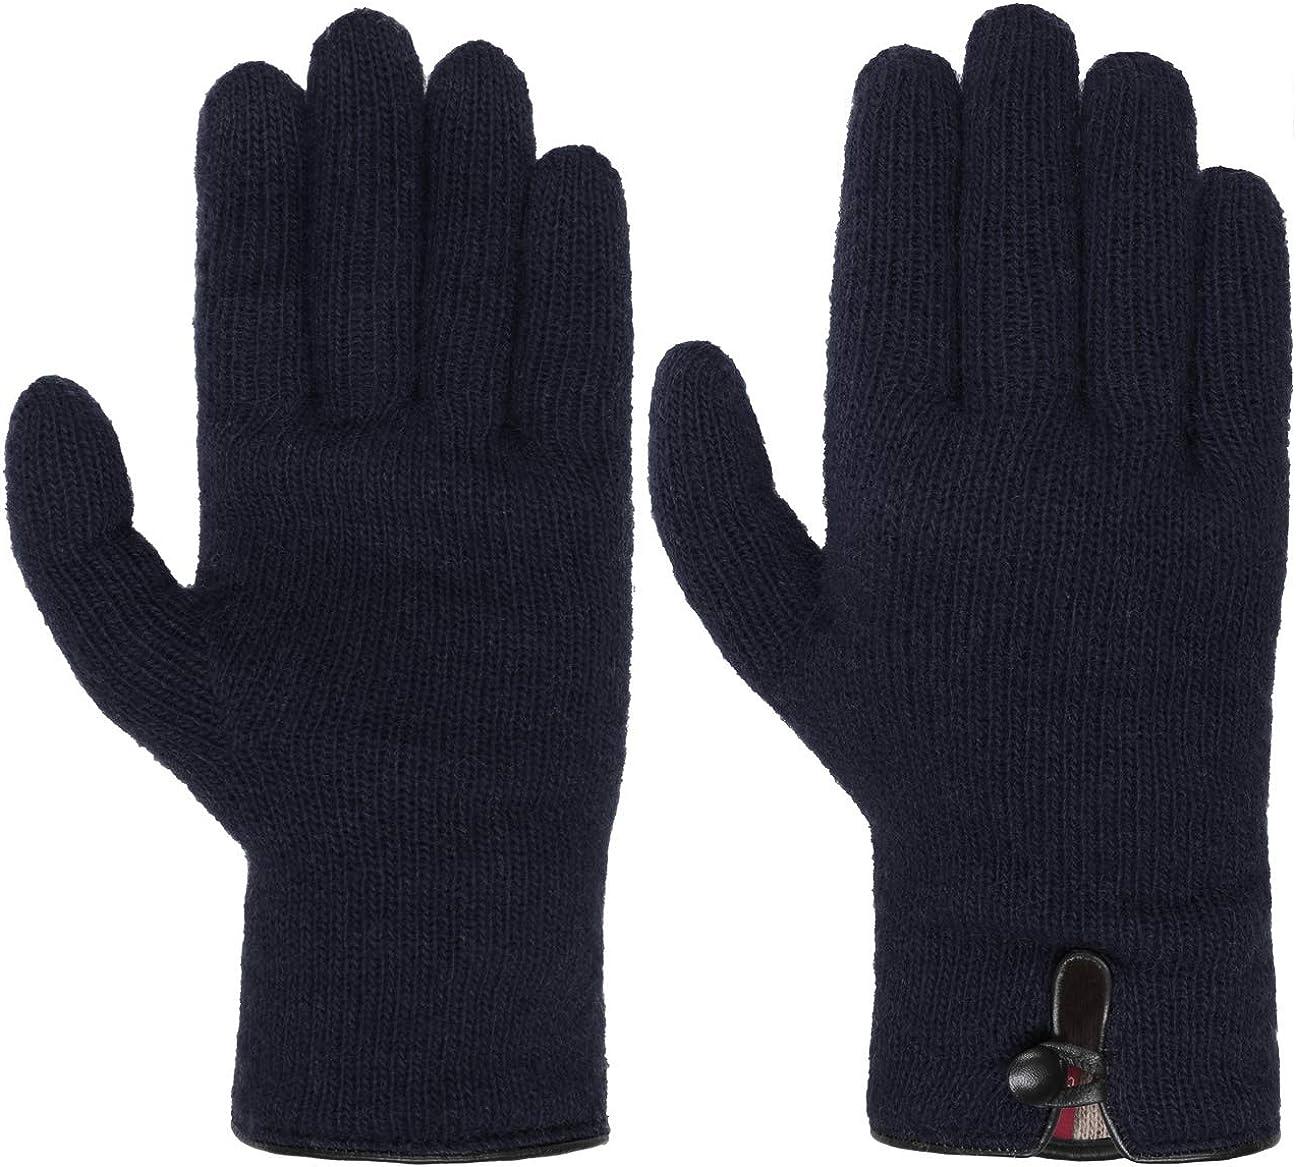 Caridei Milena Knit Gloves Women - Made in Italy